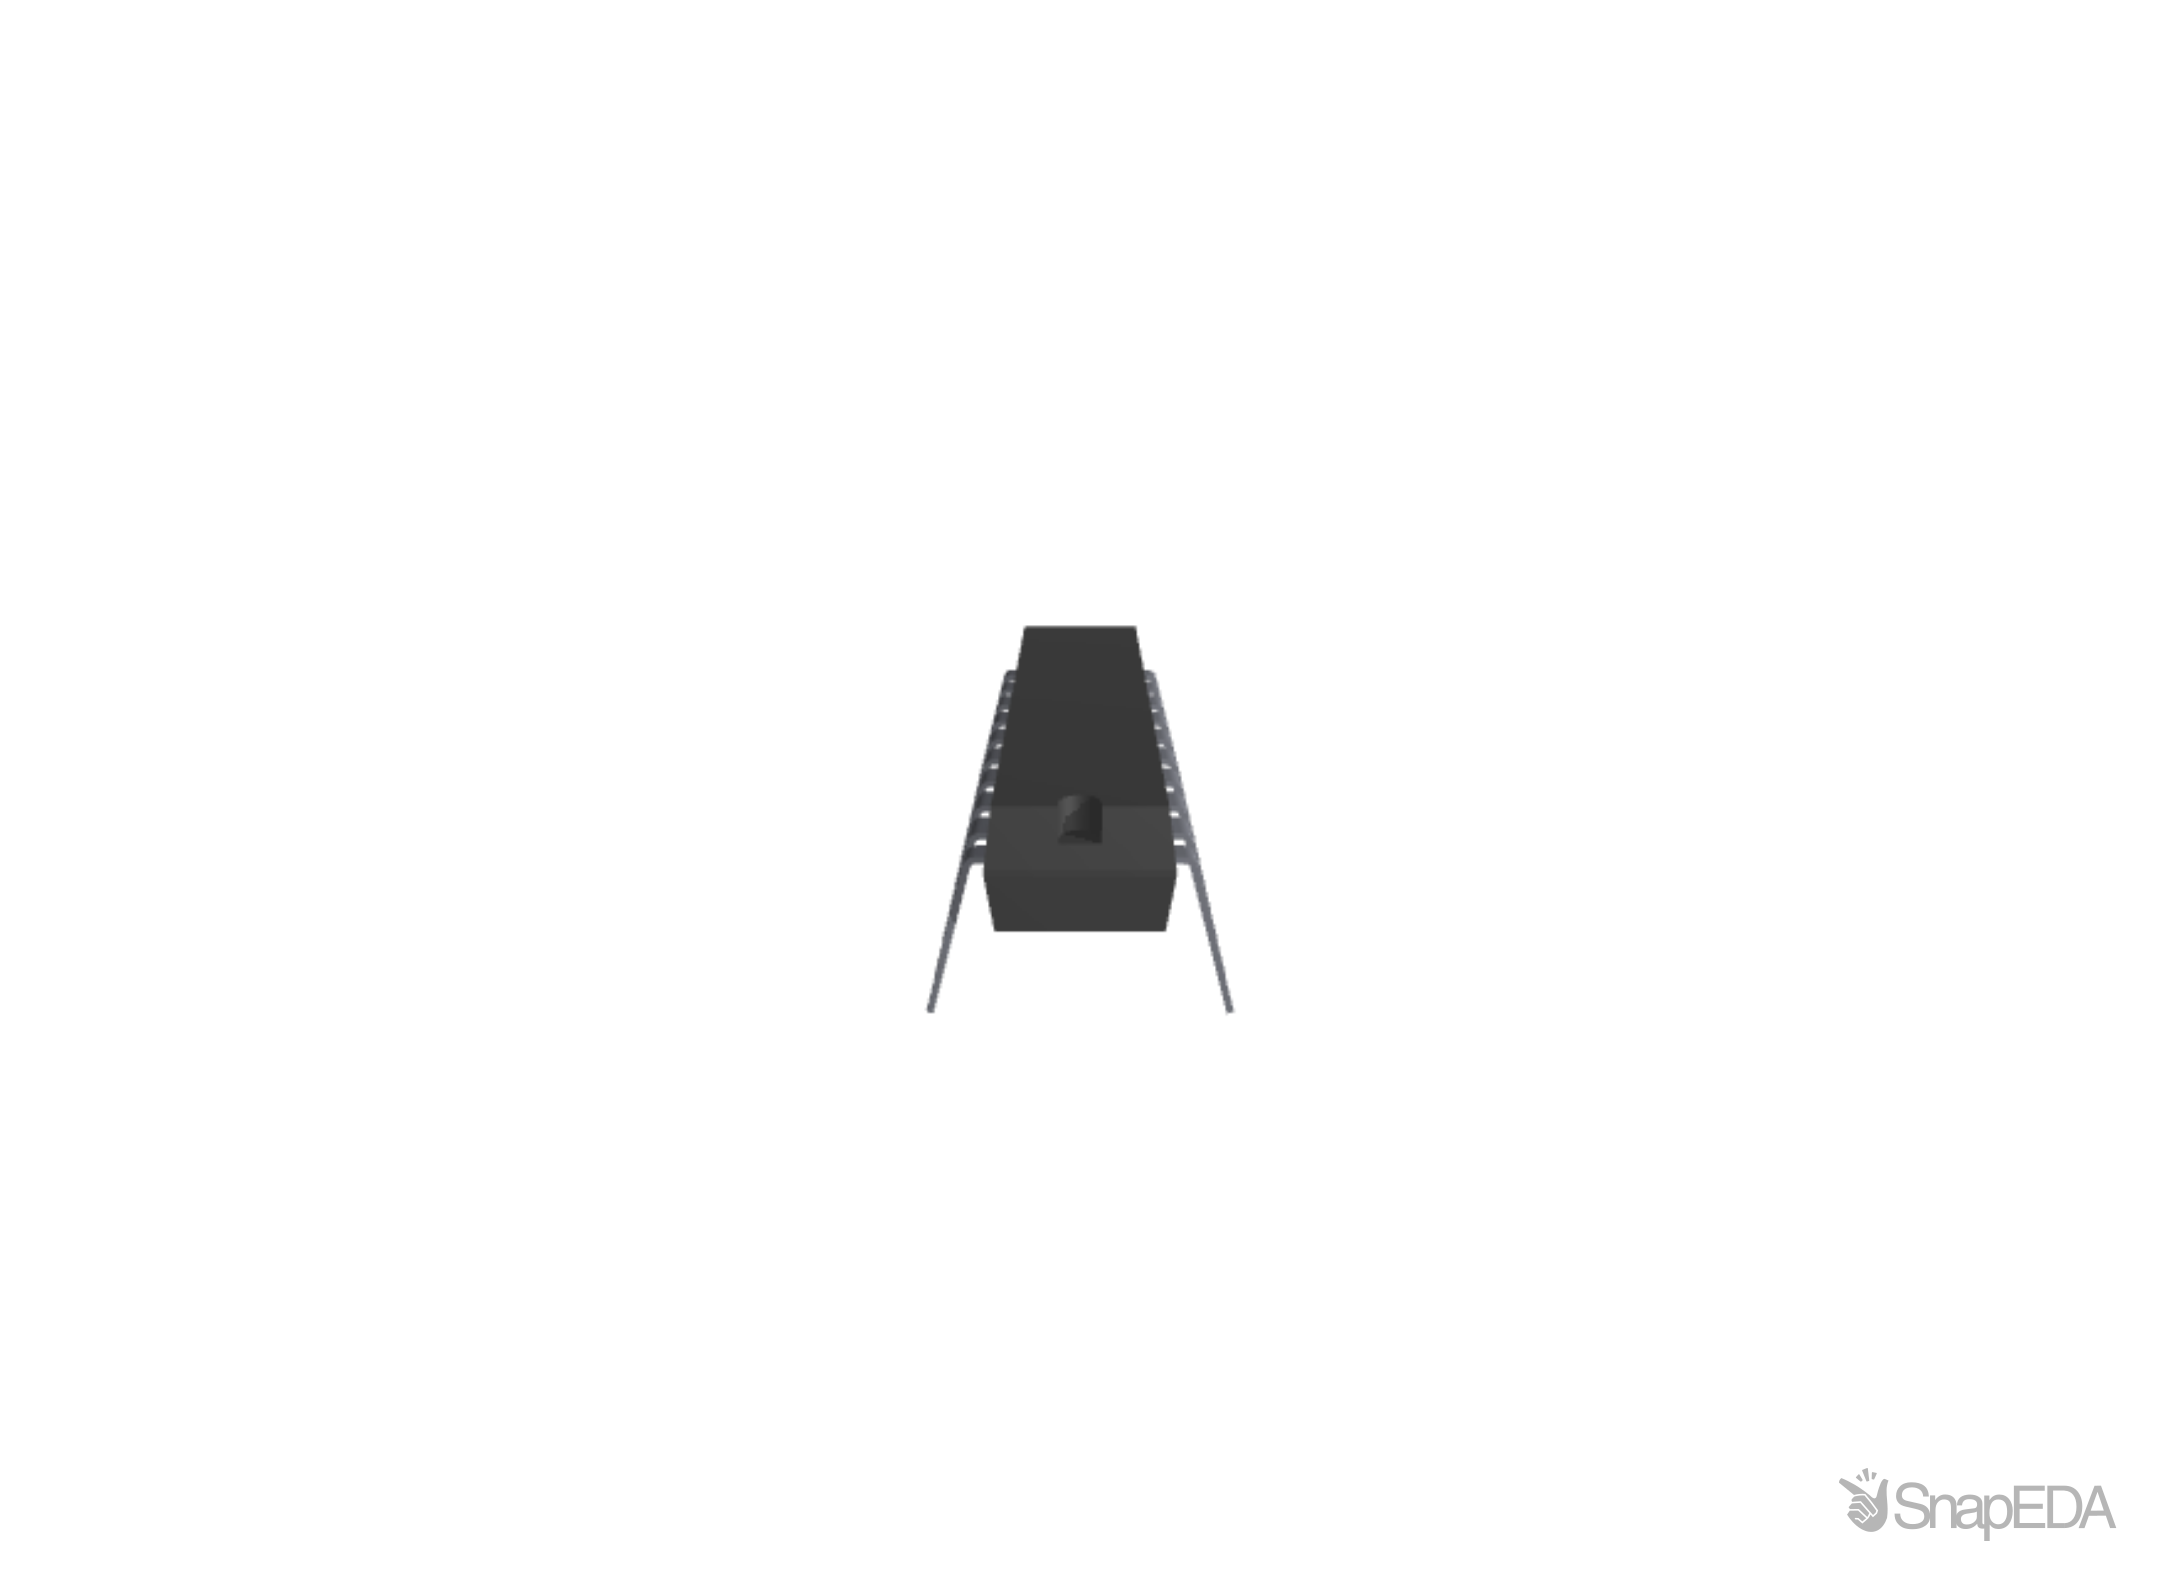 SN74HC540N 3D Model